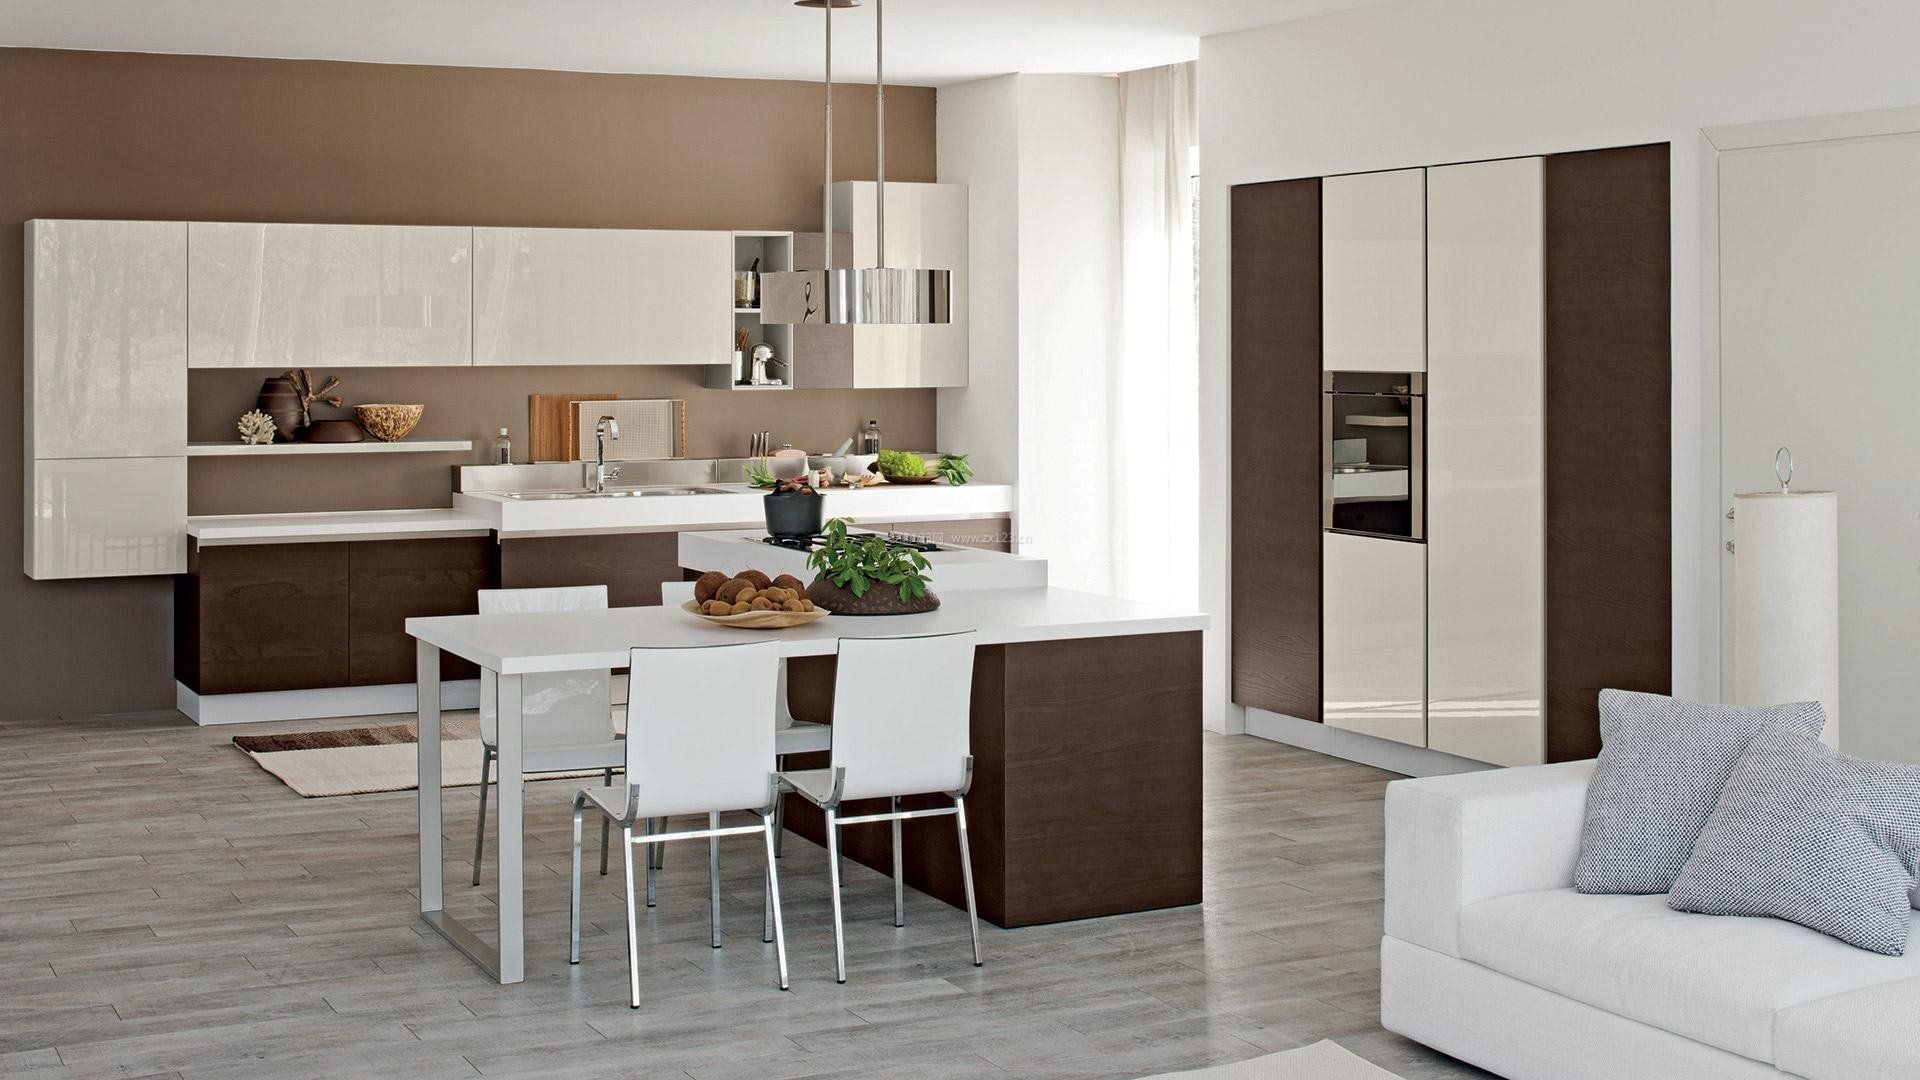 Veneer Kitchen Cabinet Doors 三室两厅样板间 什么是三室两厅 145平方米装修效果图 农村三室两厅平面图 三室两厅室内设计 120平三室两厅两卫户型